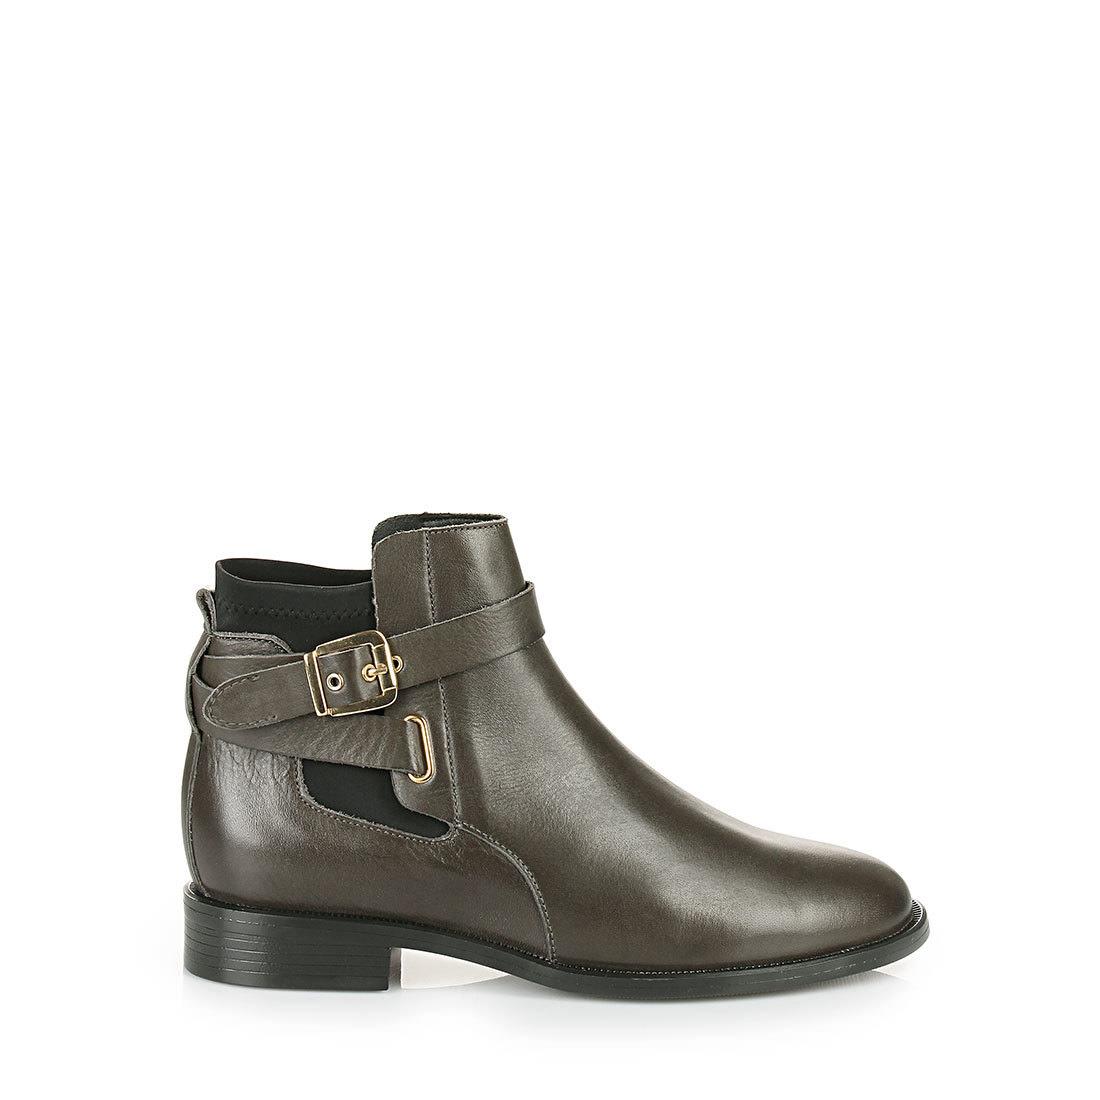 buffalo chelsea boots in dark grey buy online in buffalo online shop buffalo. Black Bedroom Furniture Sets. Home Design Ideas